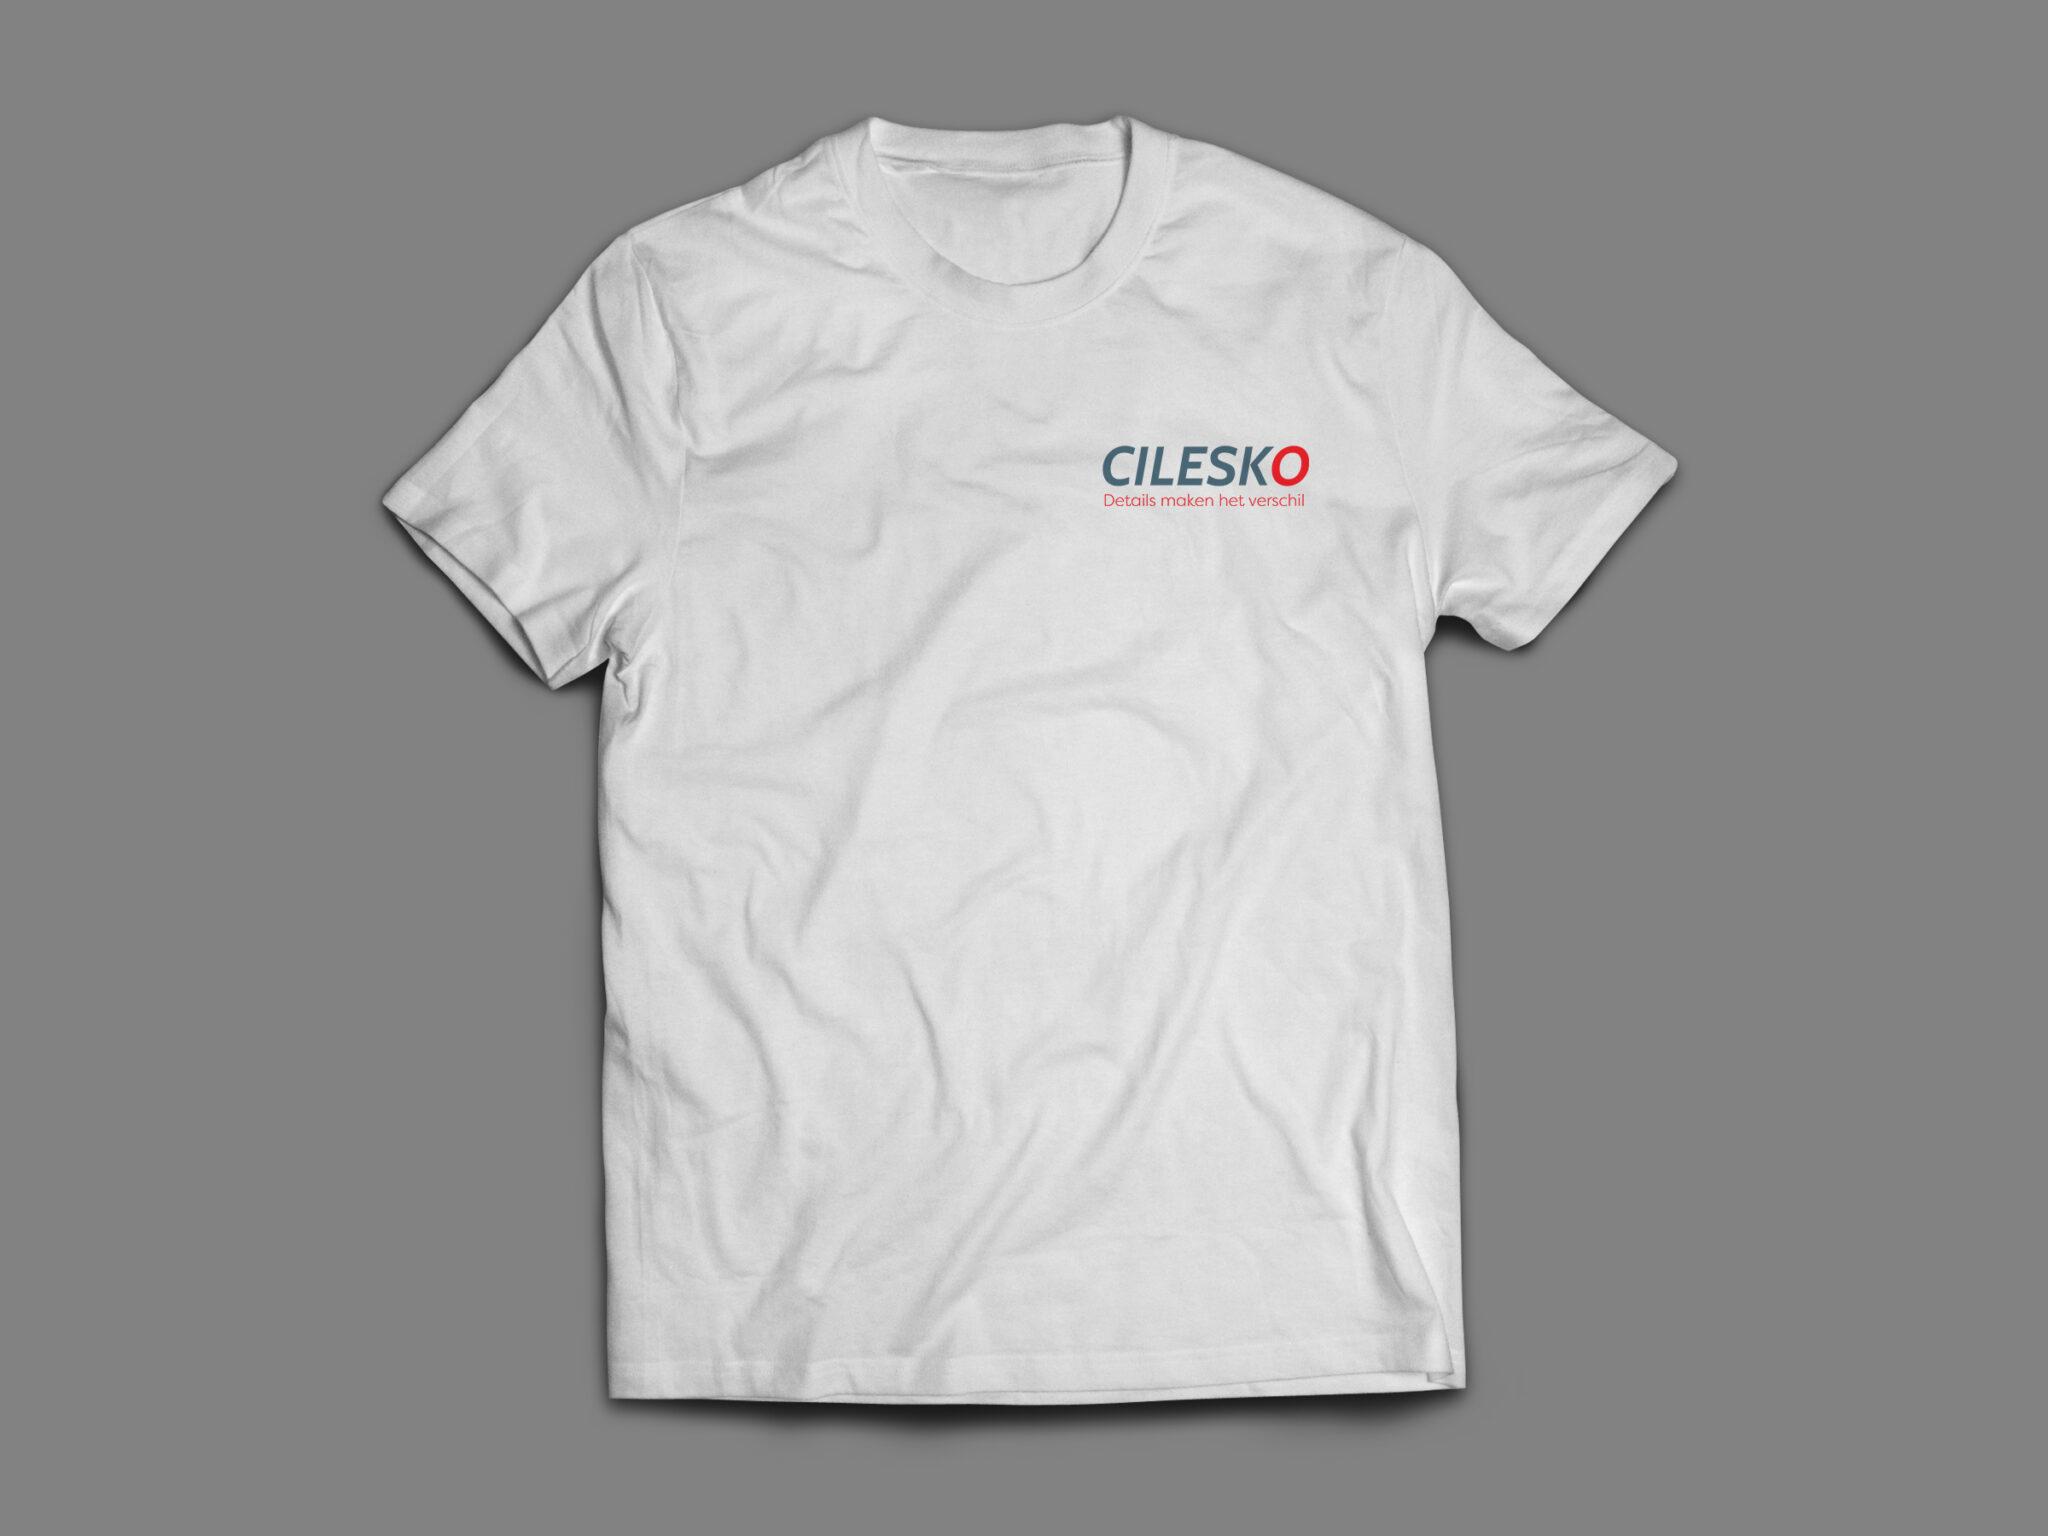 Cilesko t-shirt voorkant